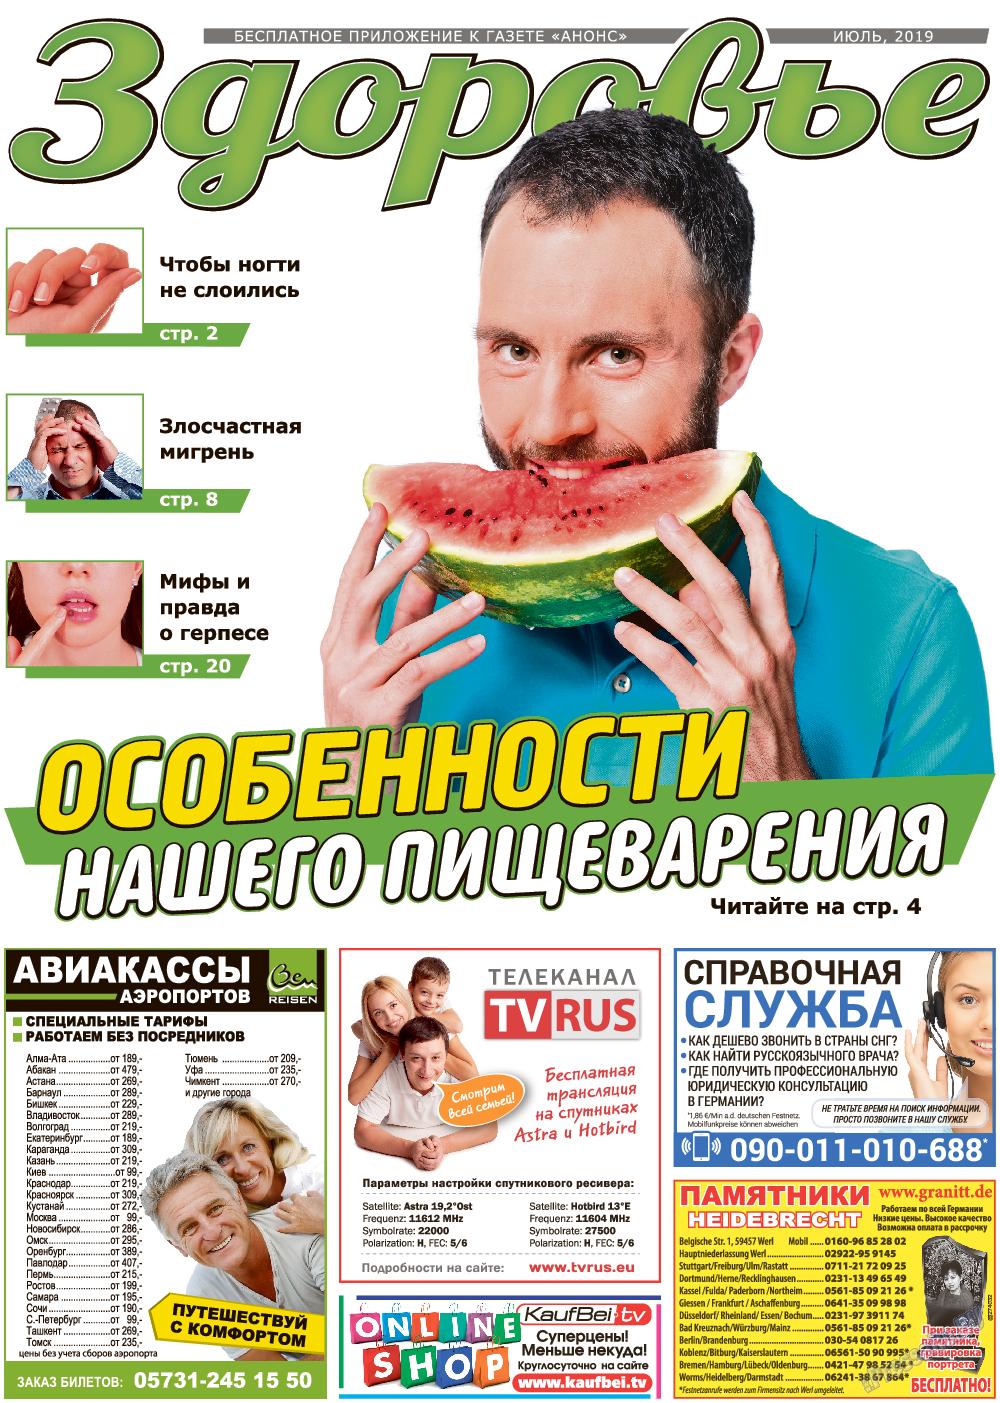 Здоровье (газета). 2019 год, номер 7, стр. 1